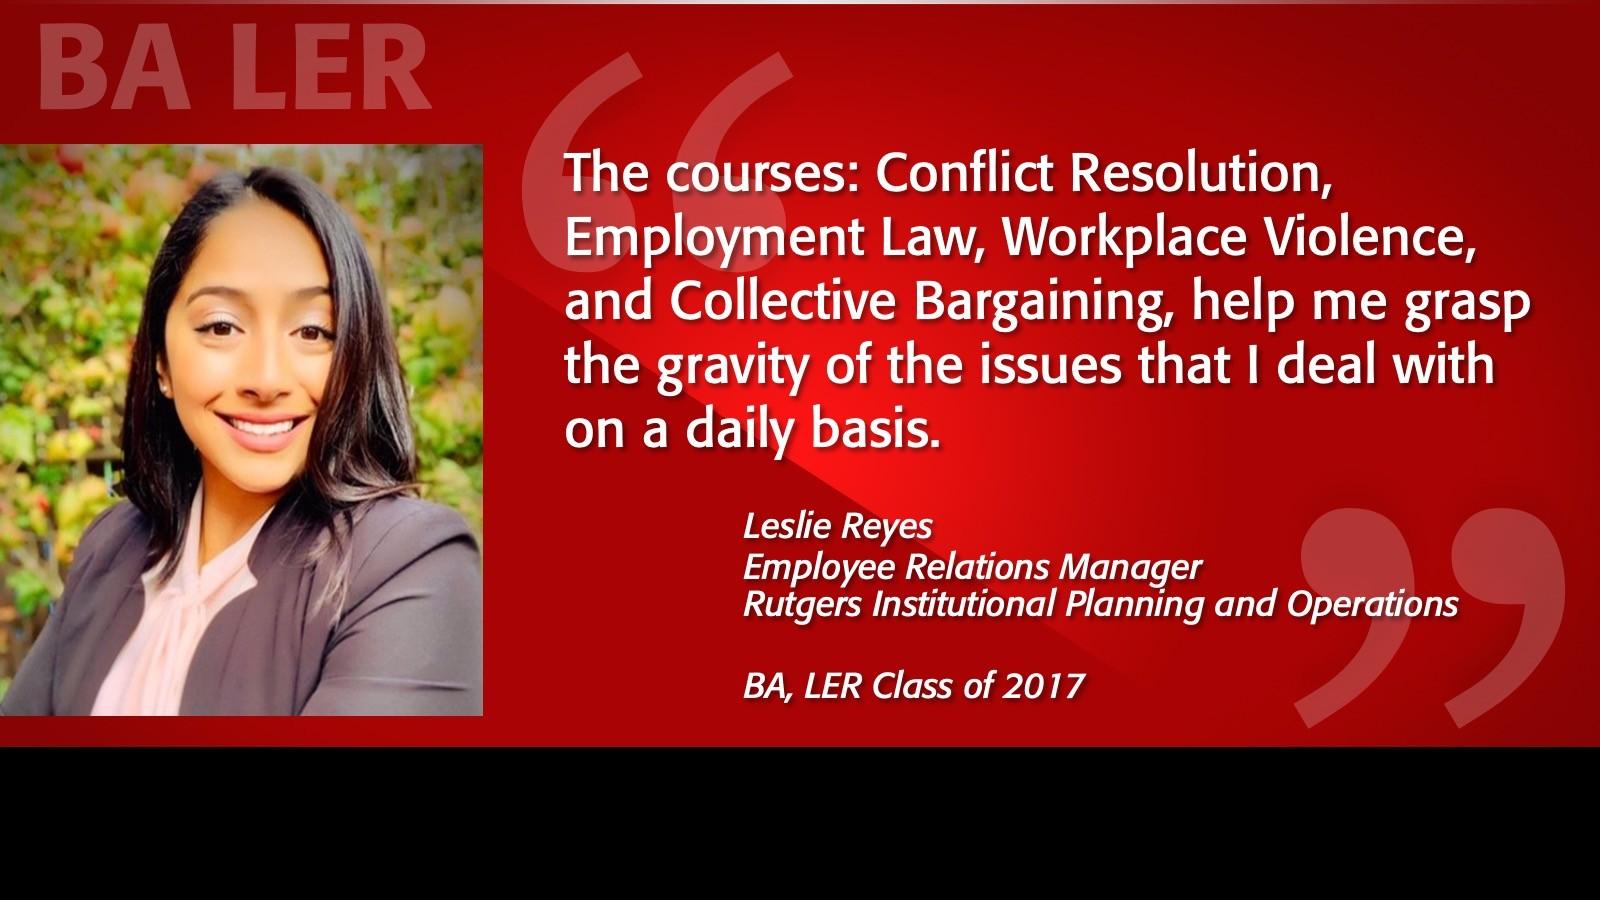 Leslie Reyes Alumni Testimonial